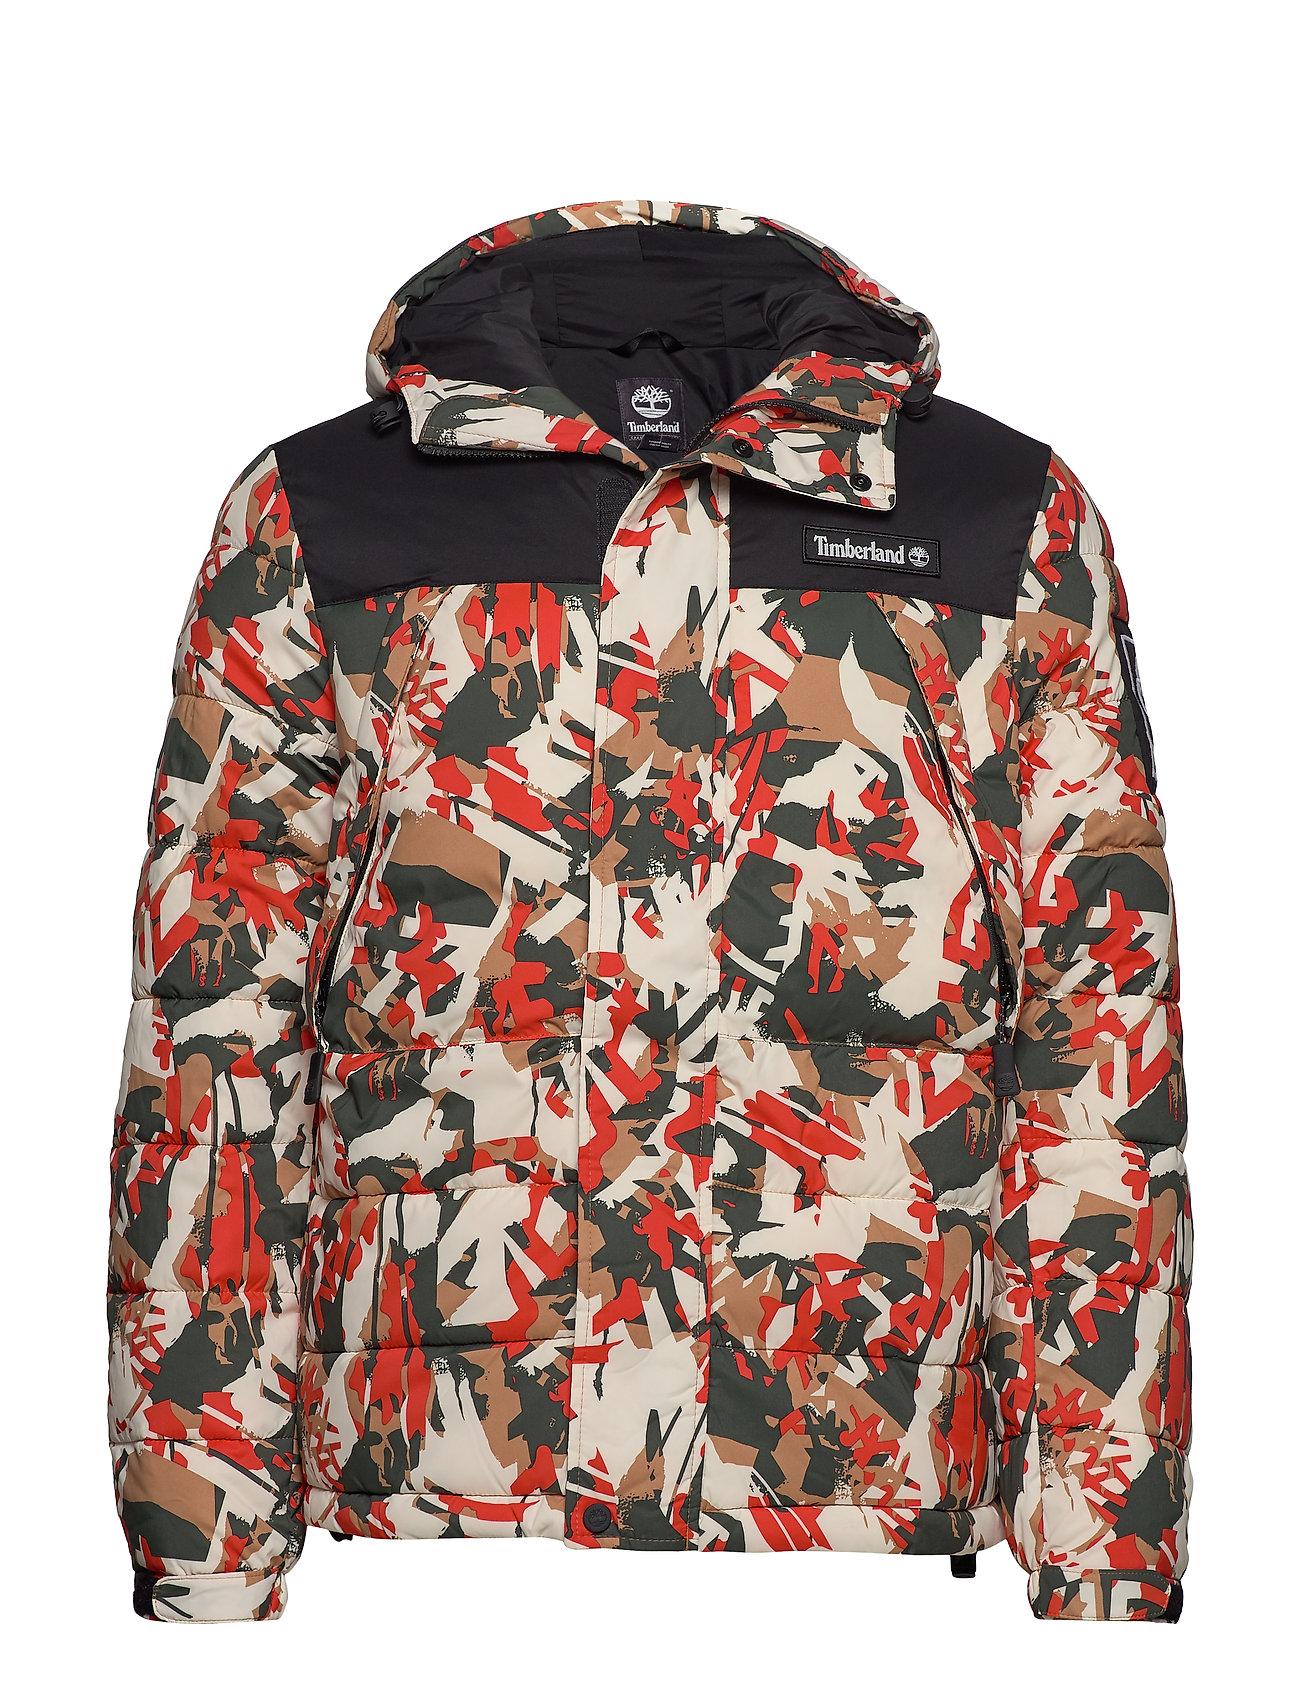 Timberland Outdoor Archive Camo Puffer Jacket - SPICY ORNGE TREK CAMO/BLK